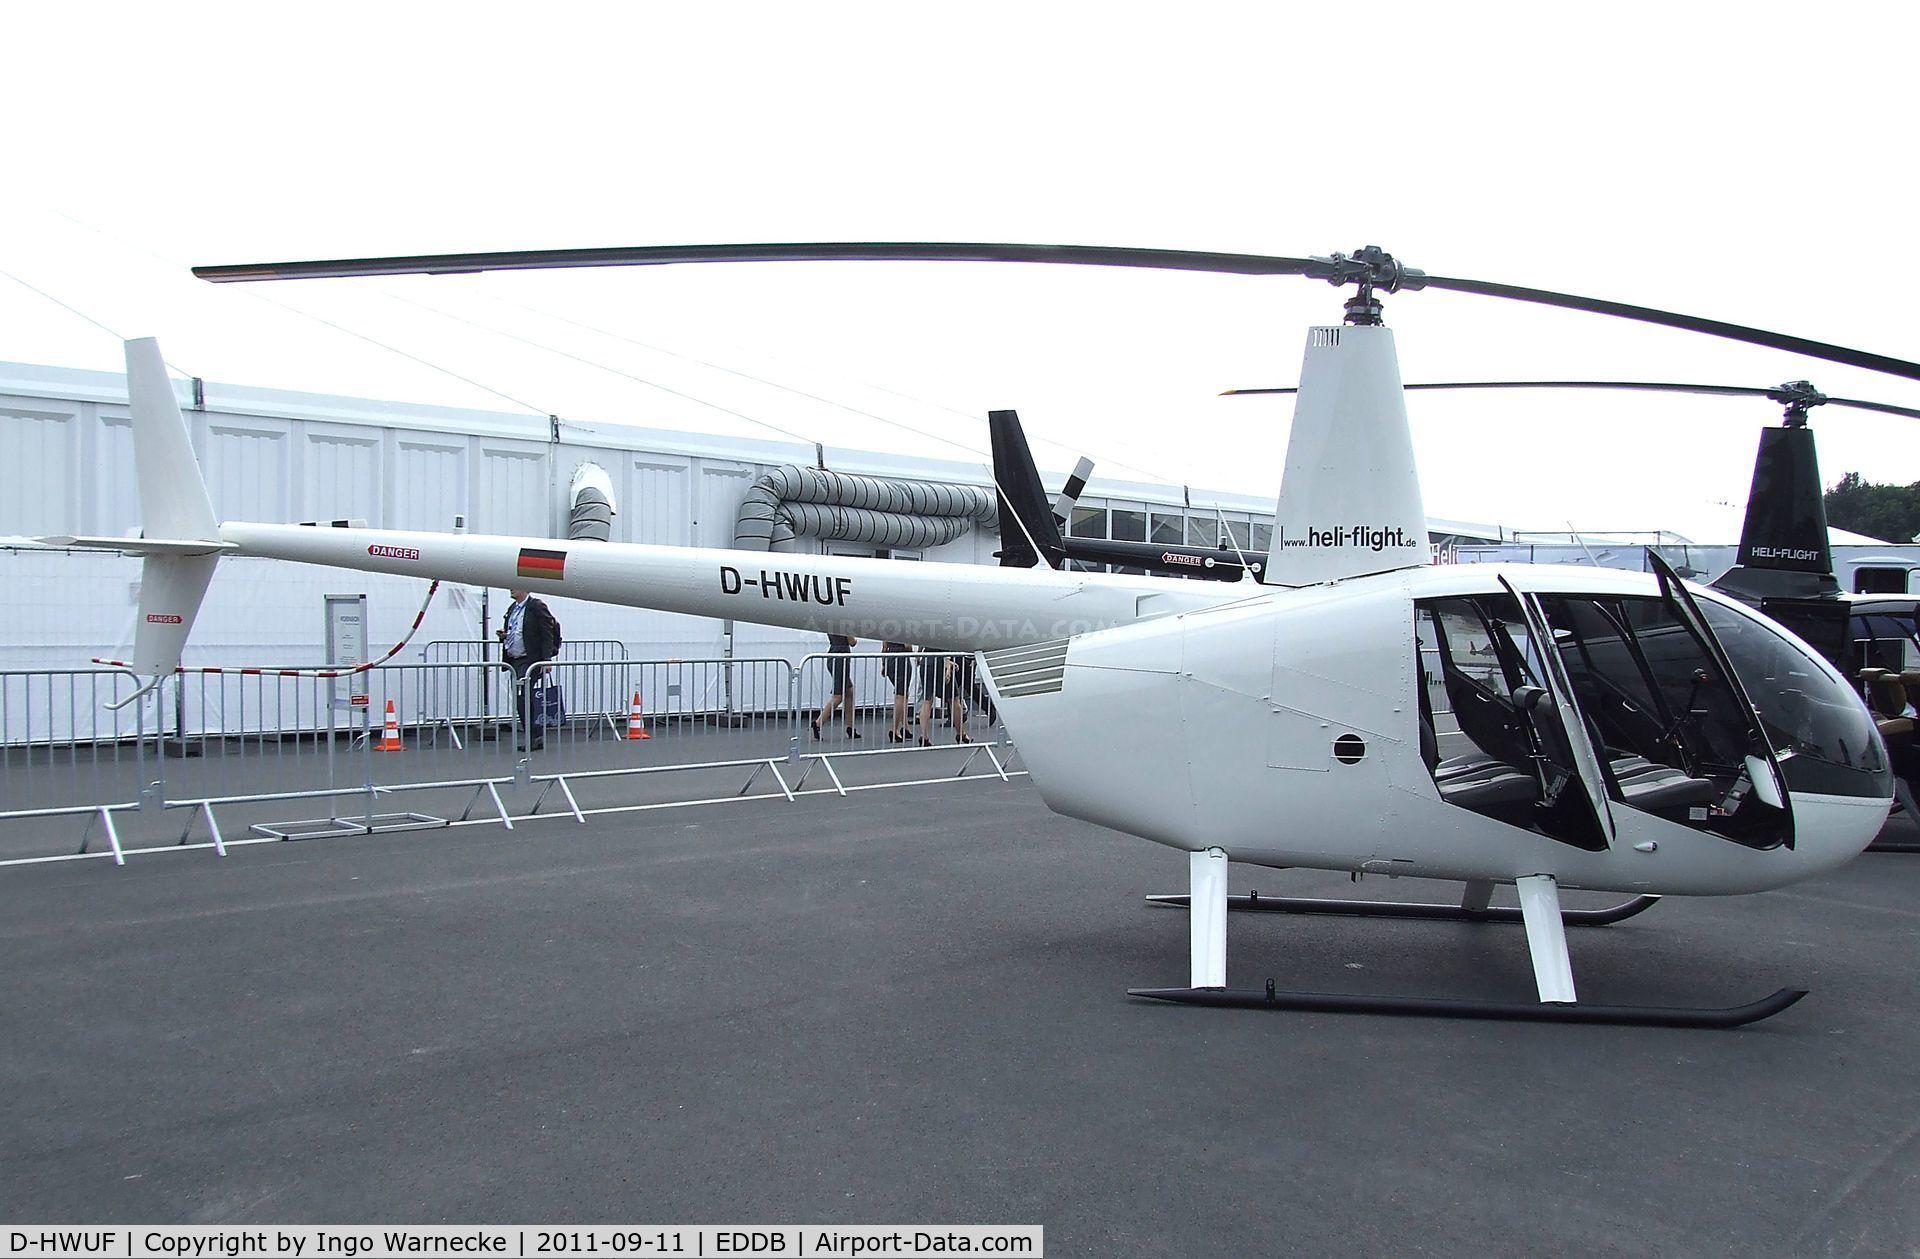 Aircraft D-HWUF (2012 Robinson R44 Raven I C/N 2220) Photo